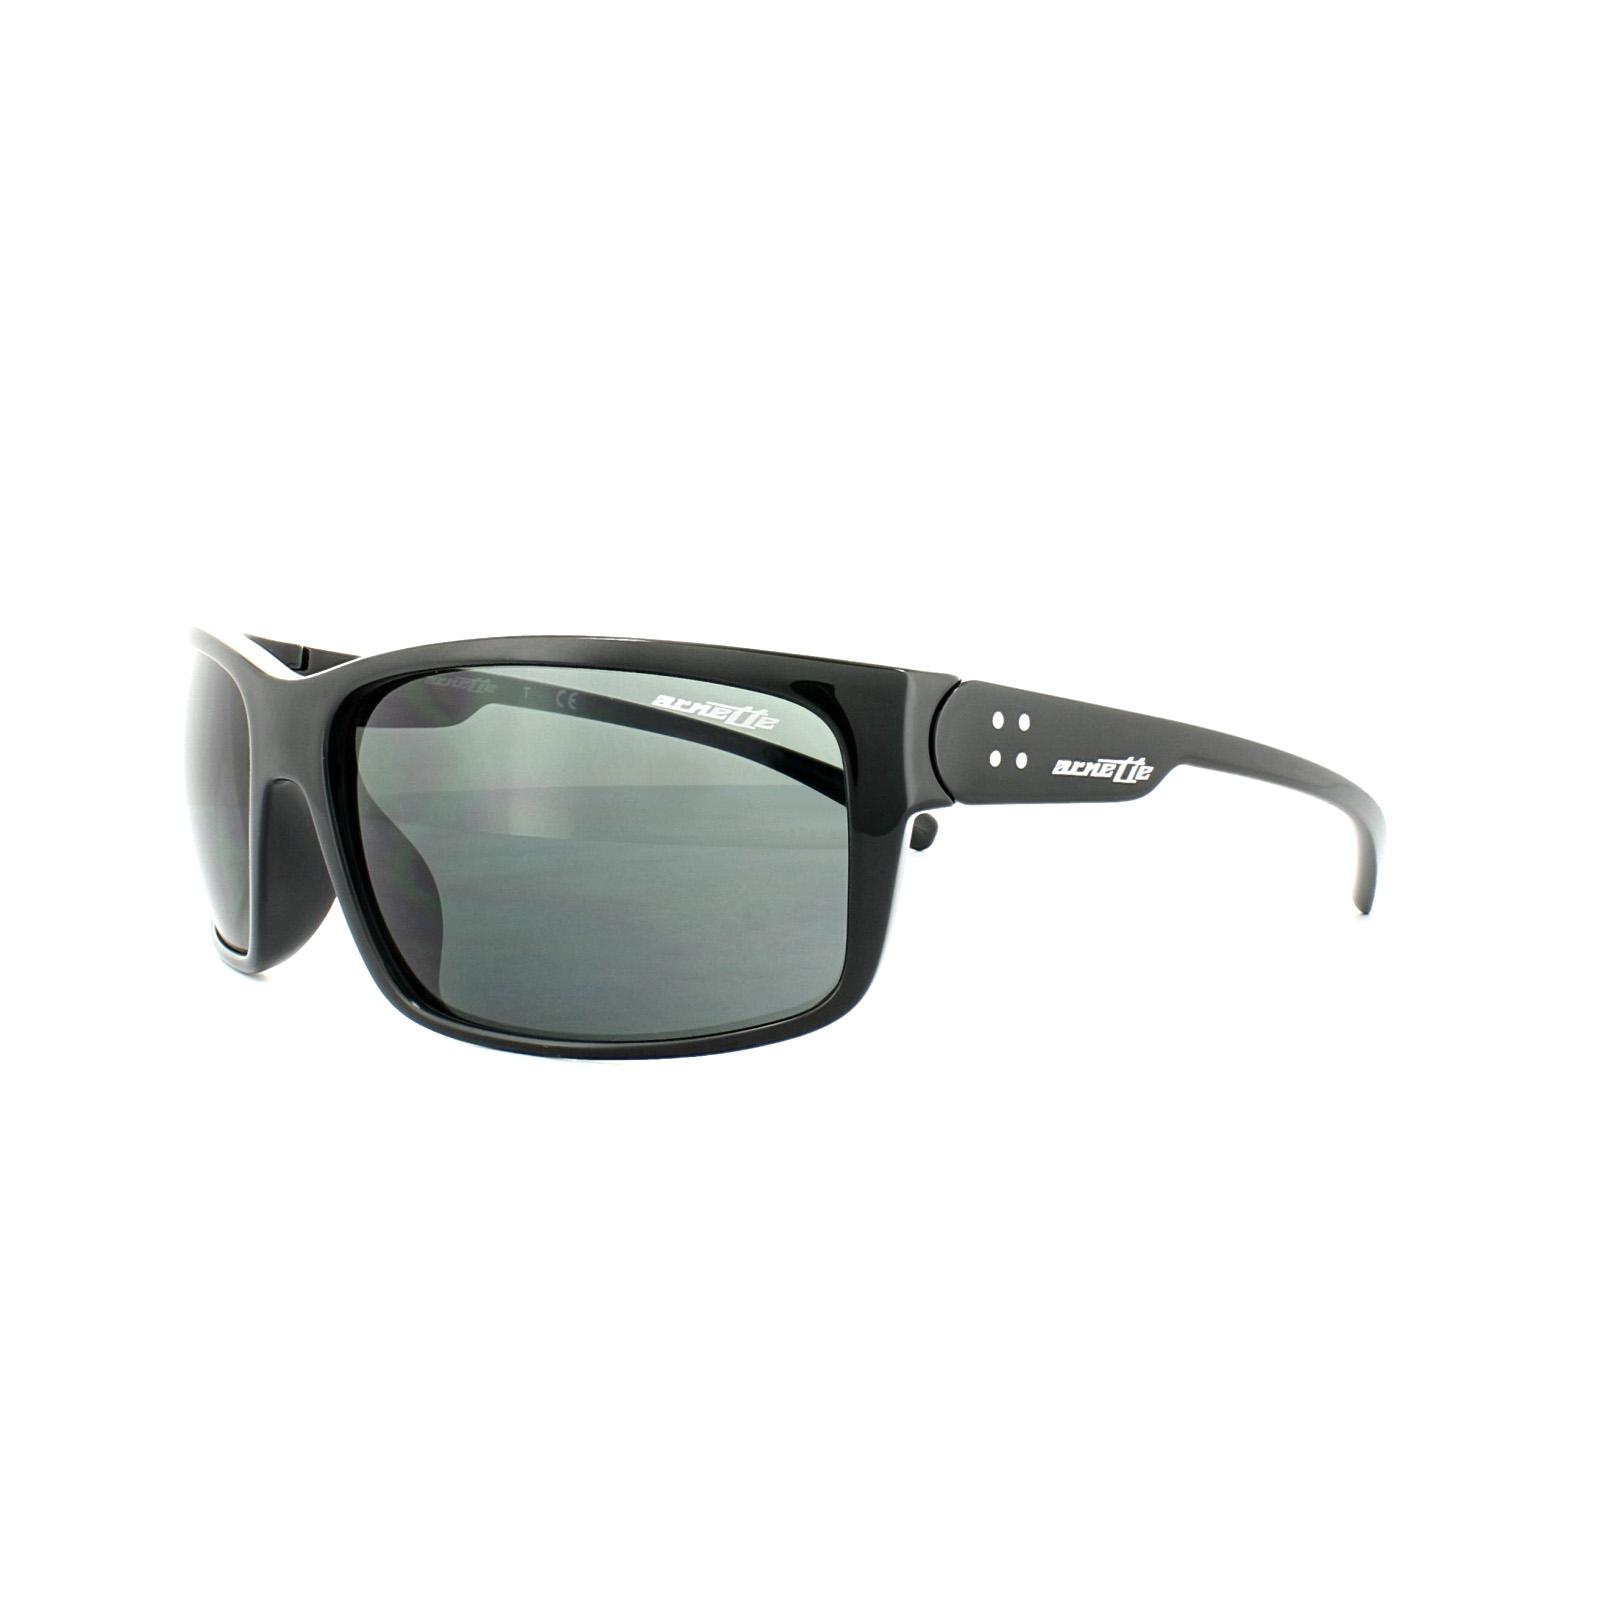 8888650844492 Cheap Arnette Fastball 2.0 4242 Sunglasses - Discounted Sunglasses